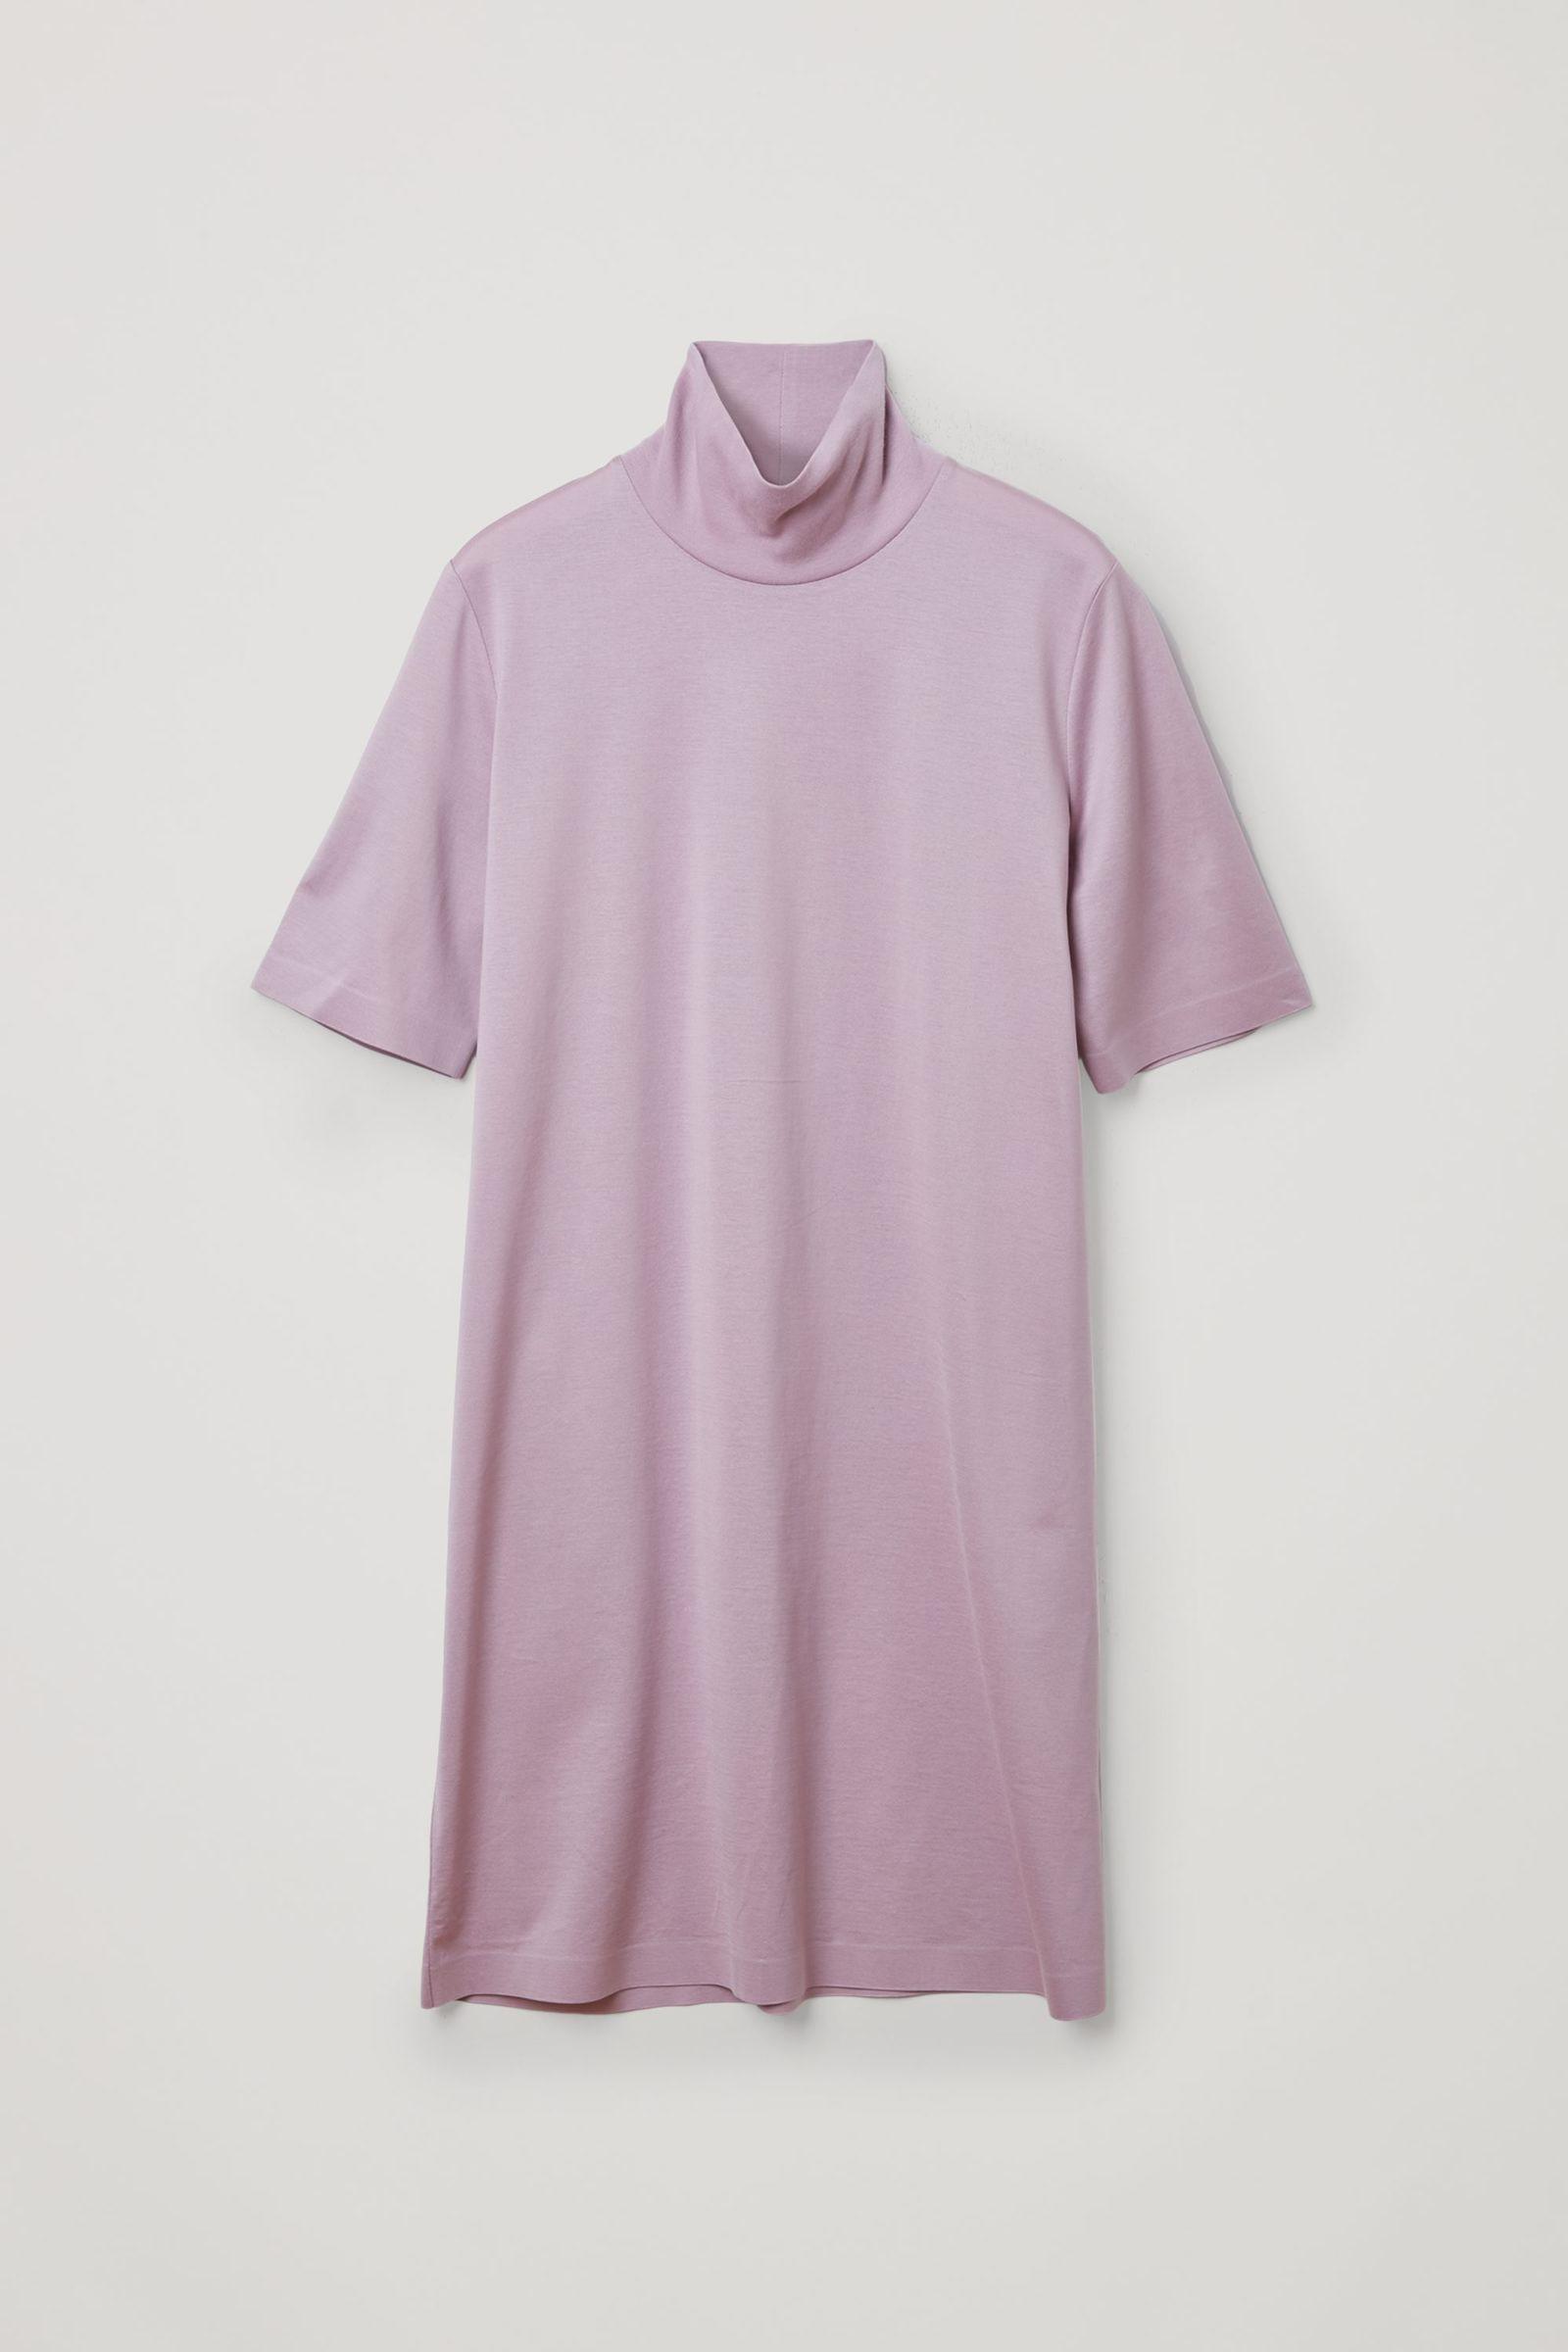 COS 코튼 롤넥 티셔츠 드레스의 라이트 퍼플컬러 Product입니다.